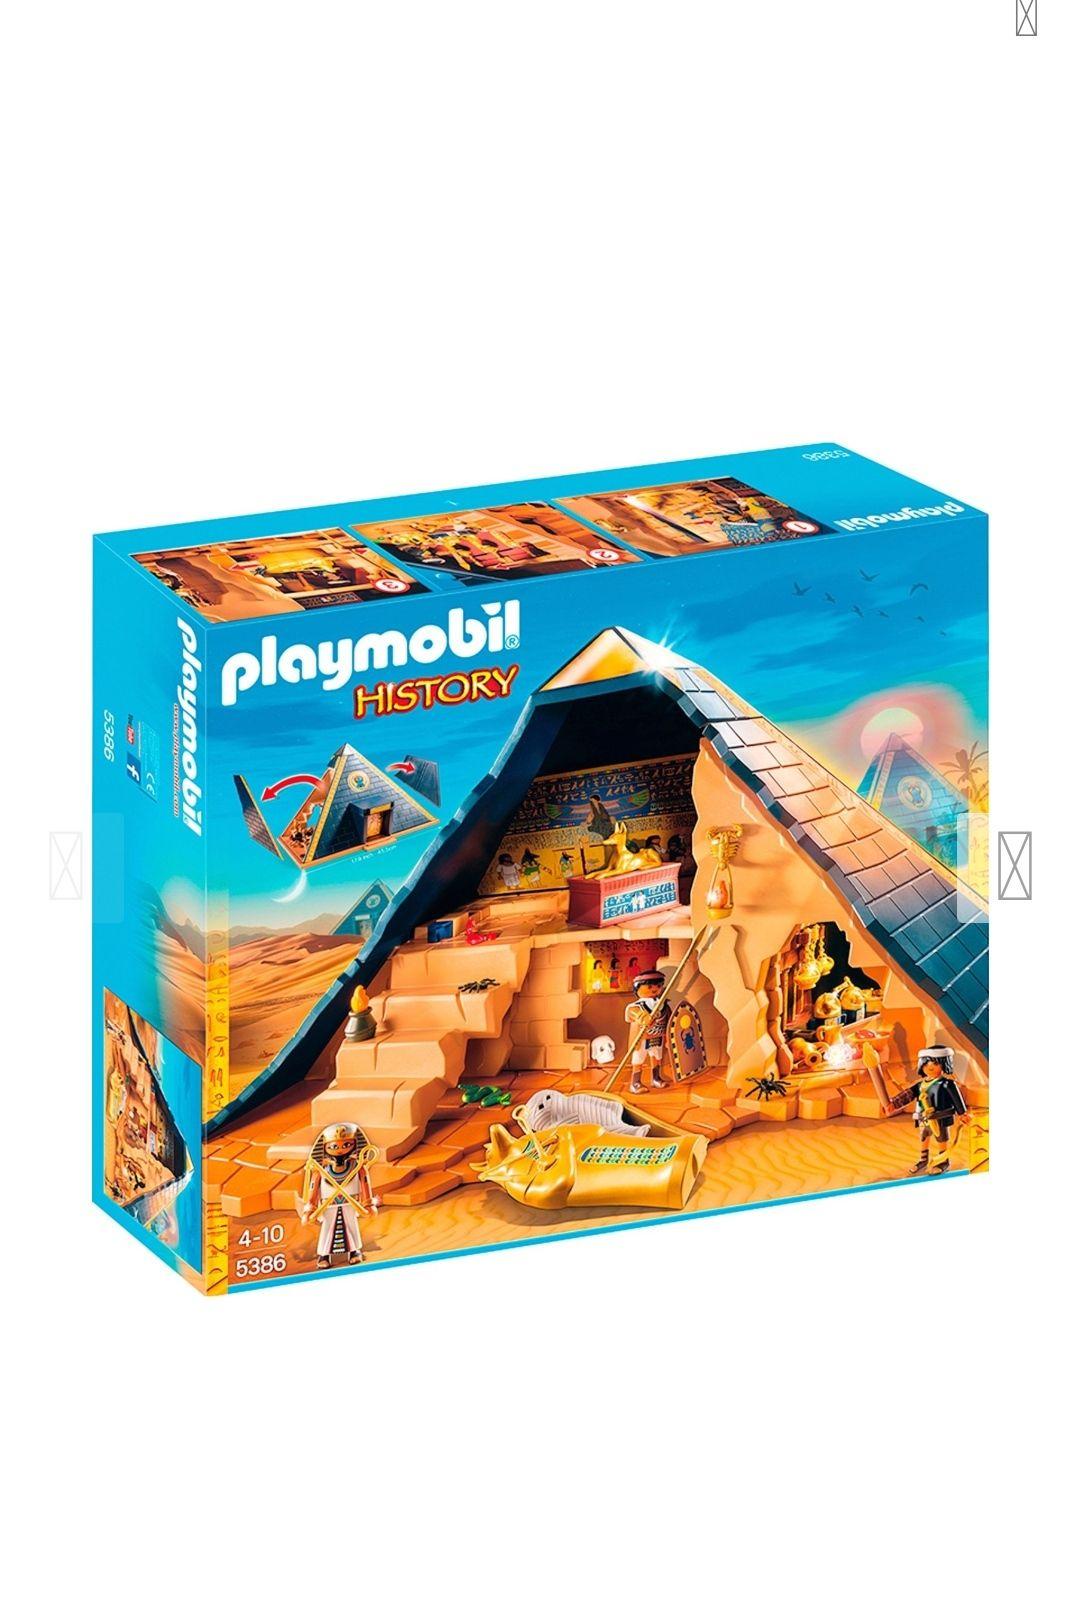 Die Pyramide des Pharaos von PLAYMOBIL